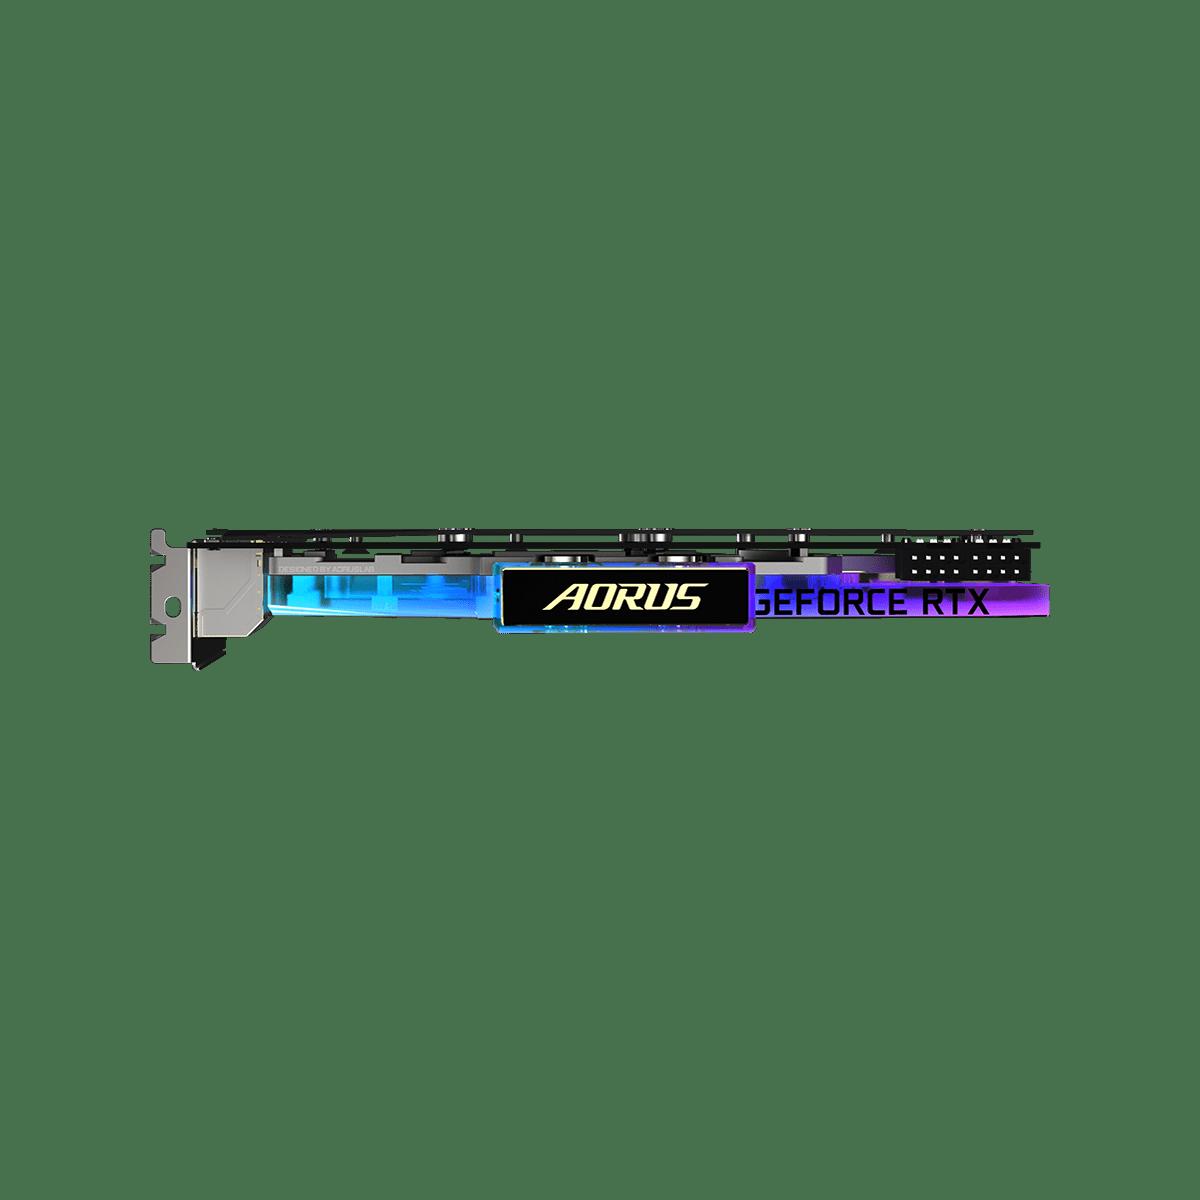 GIGABYTE AORUS GeForce RTX 3080 XTREME WATERFORCE WB 10G